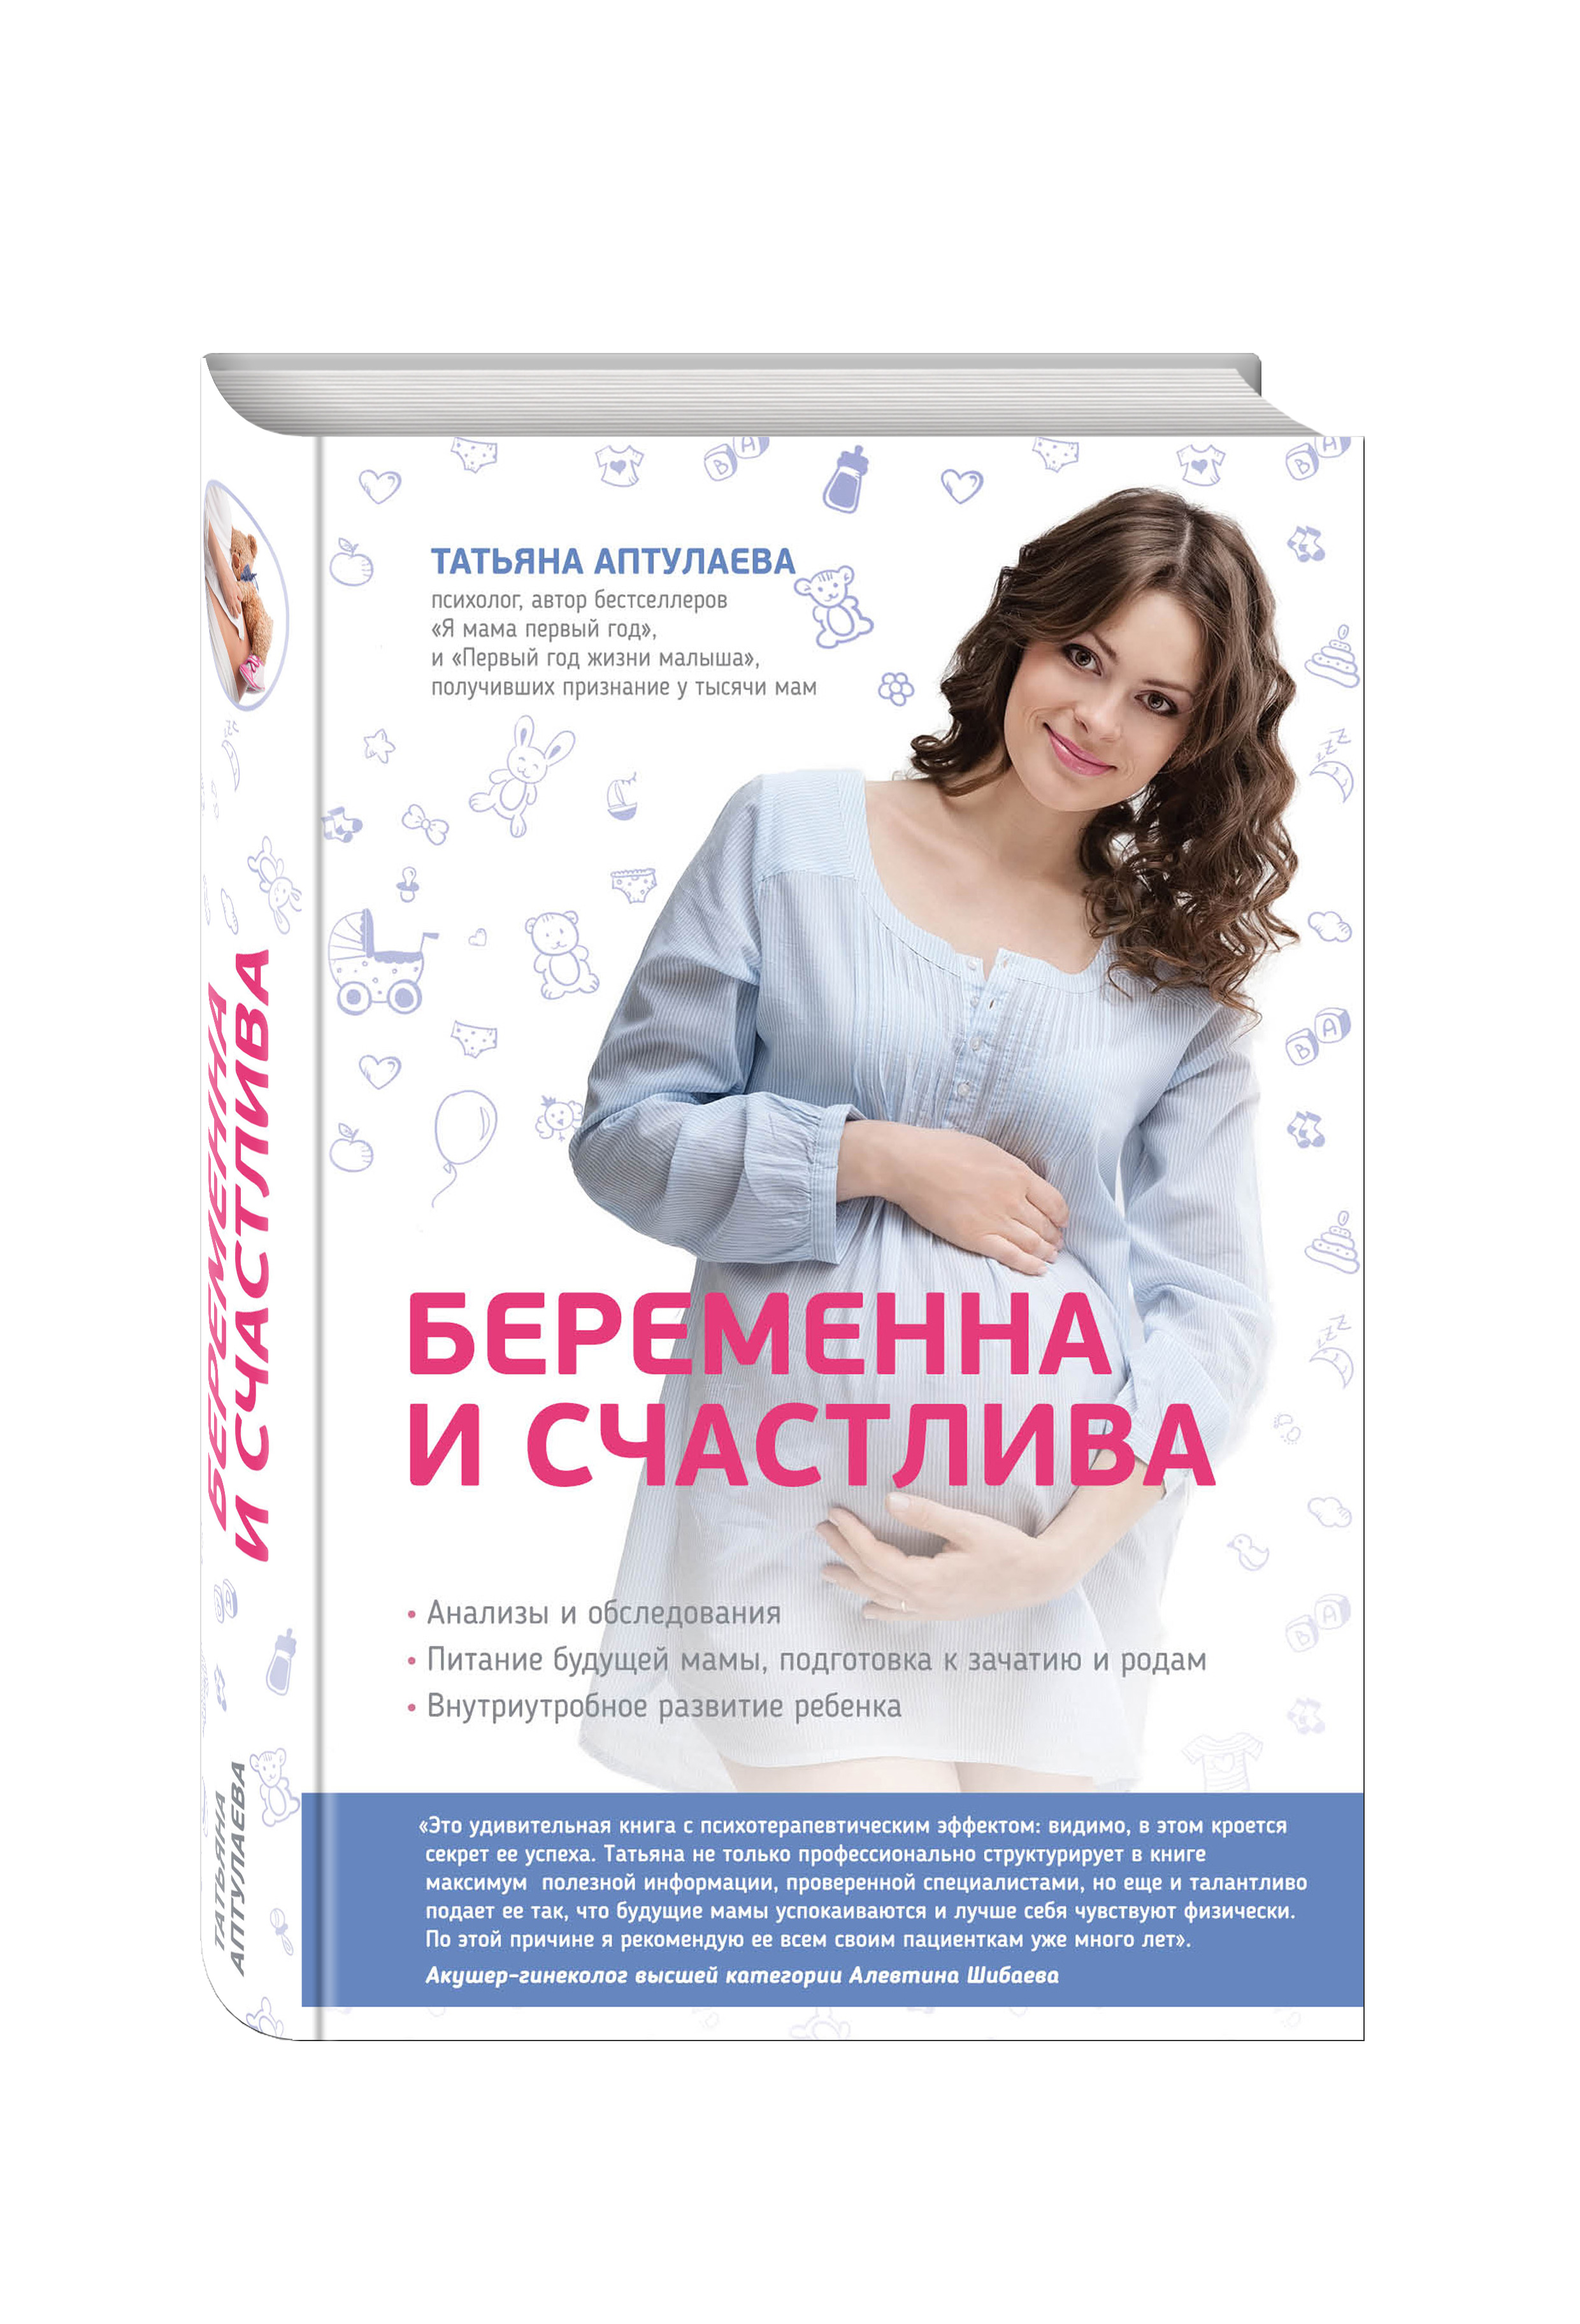 Татьяна Аптулаева Беременна и счастлива